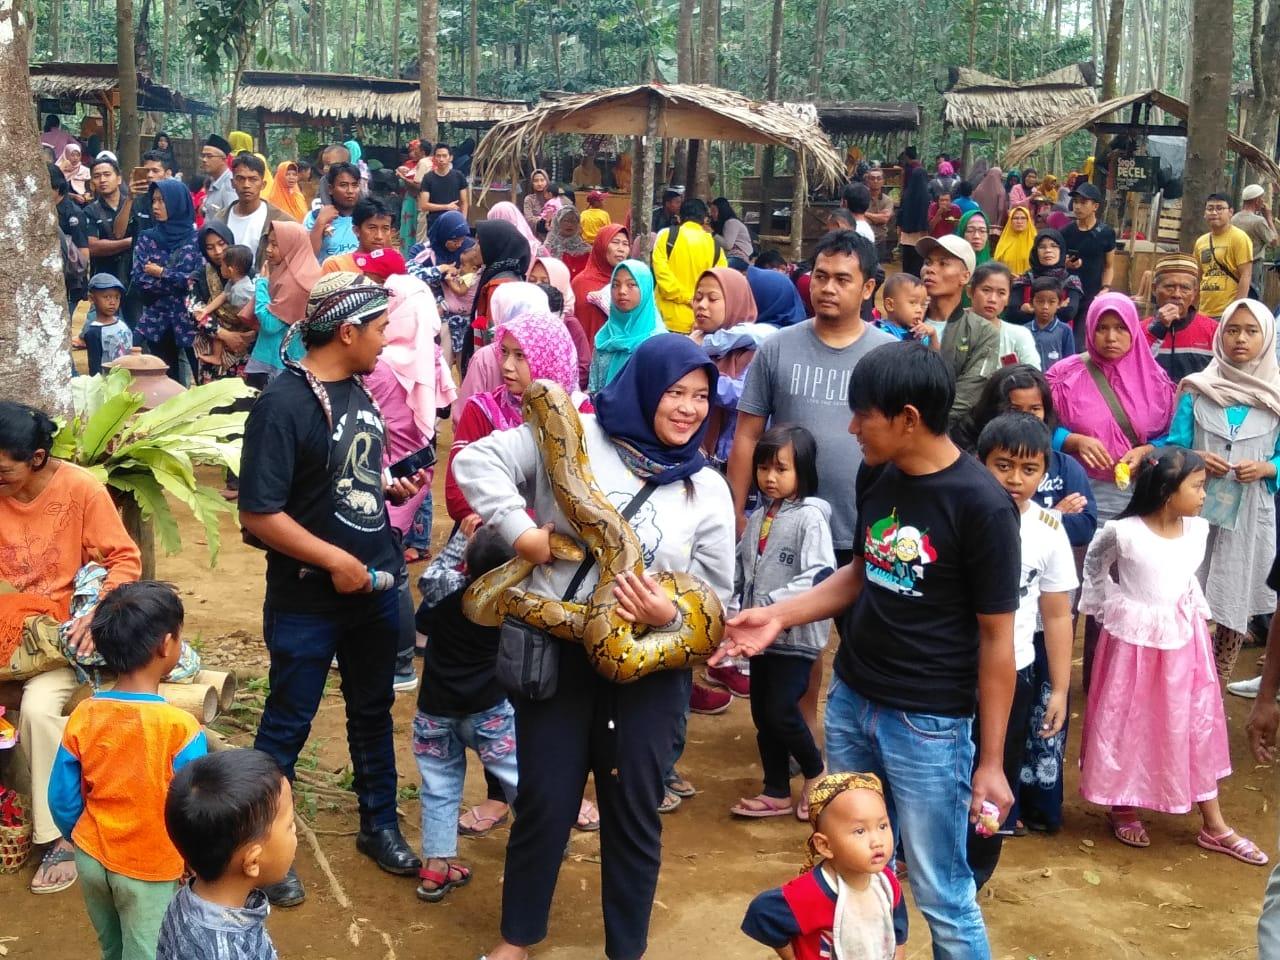 Sosialisasi Cara Penanganan Ular Rangkaian Anniversary Ke-7 Kopes